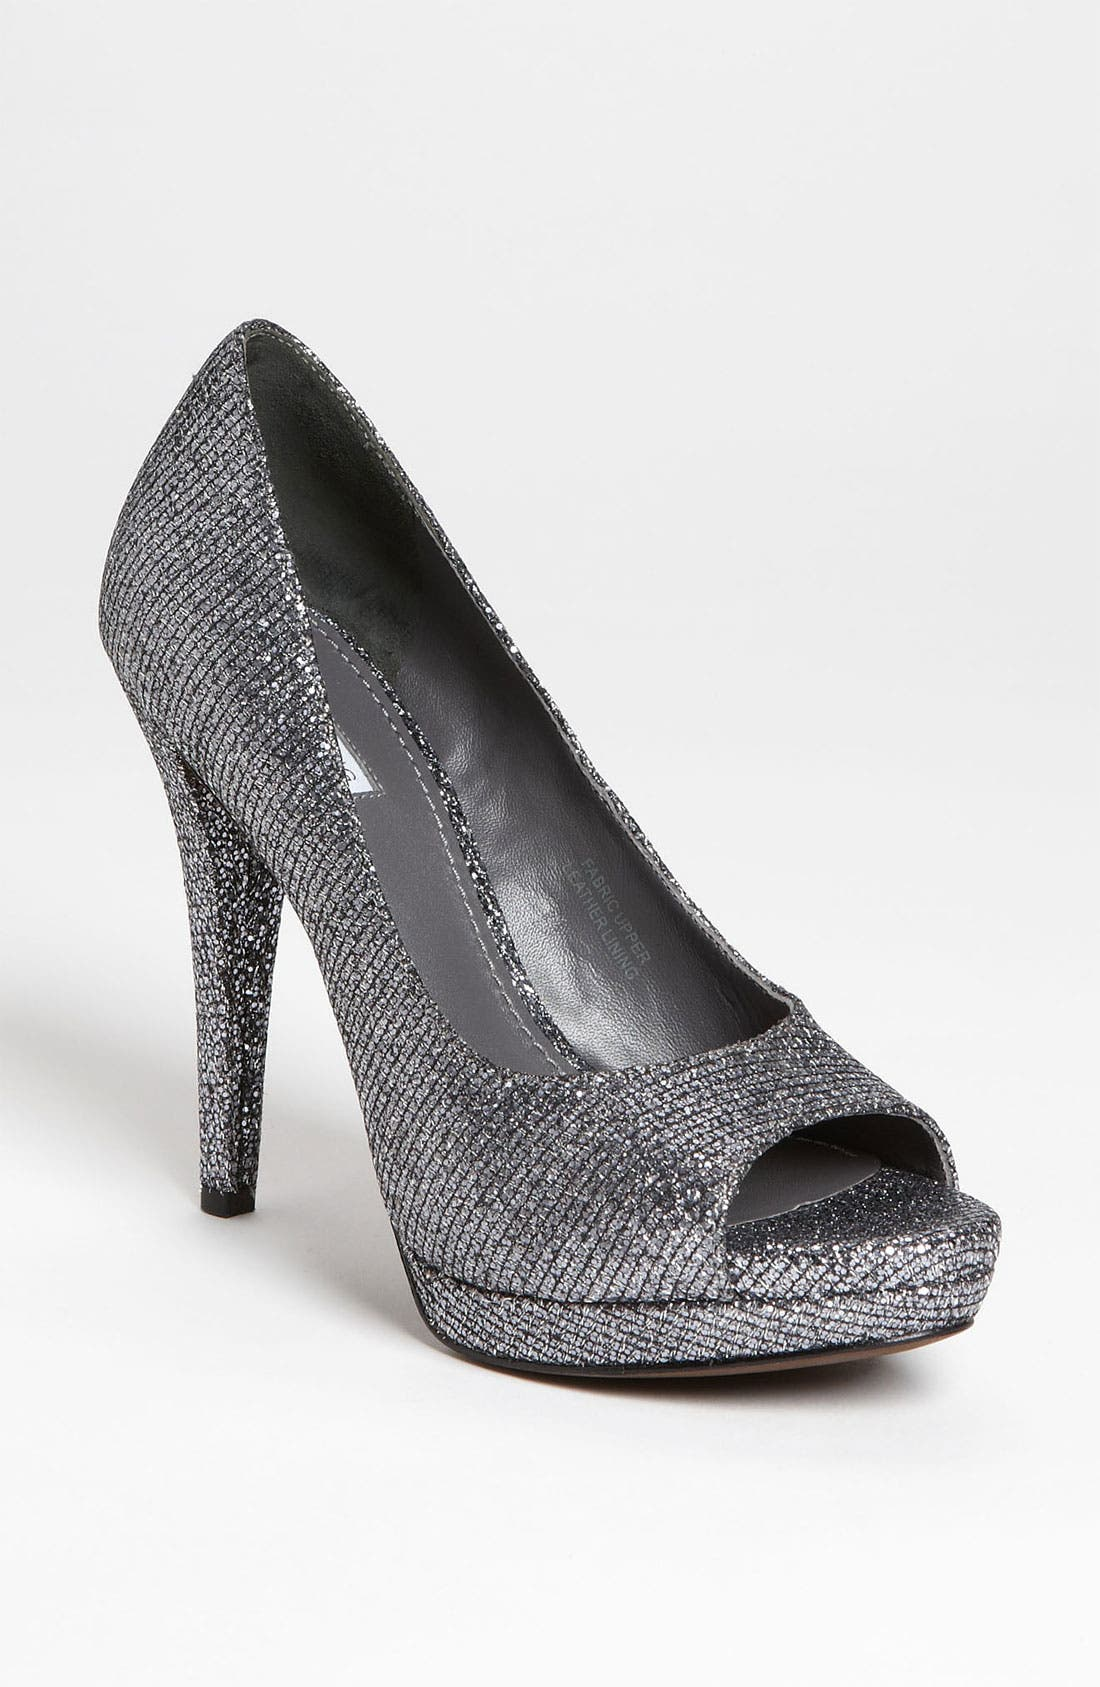 Footwear 'Selima' Peep Toe Pump,                             Main thumbnail 3, color,